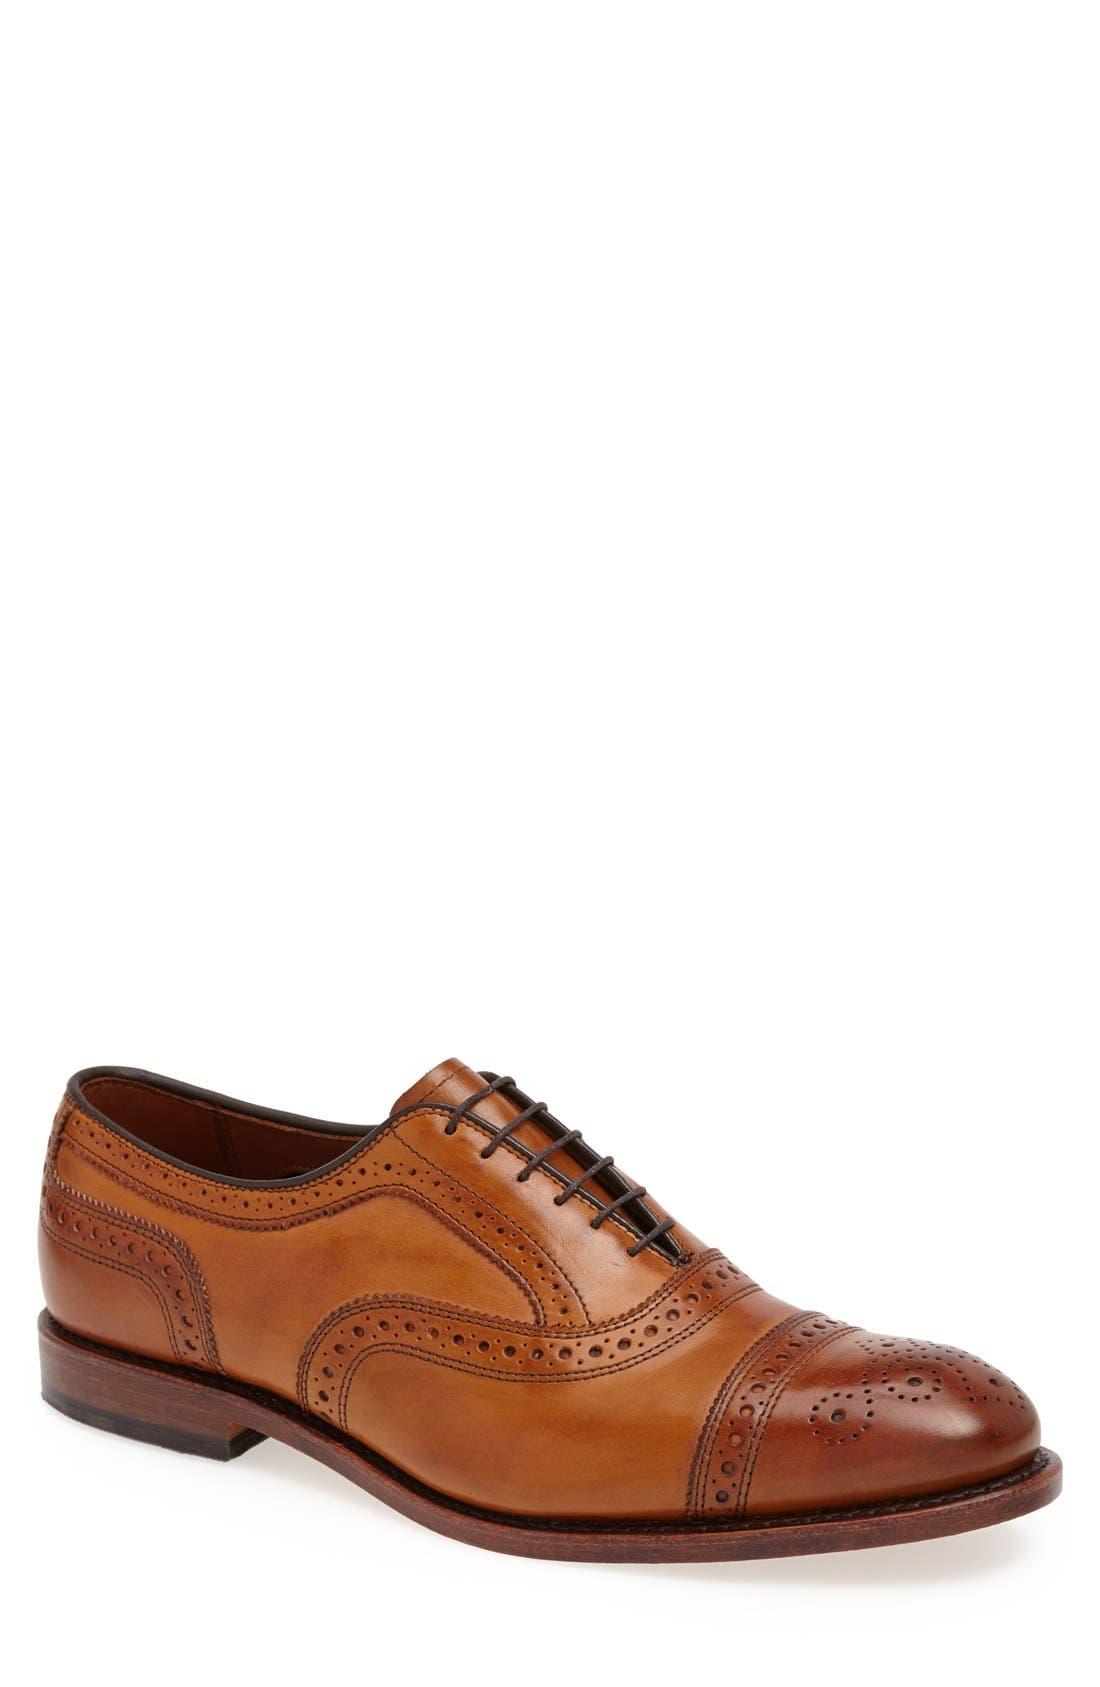 'Strand' Cap Toe Oxford,                             Main thumbnail 1, color,                             Walnut Leather